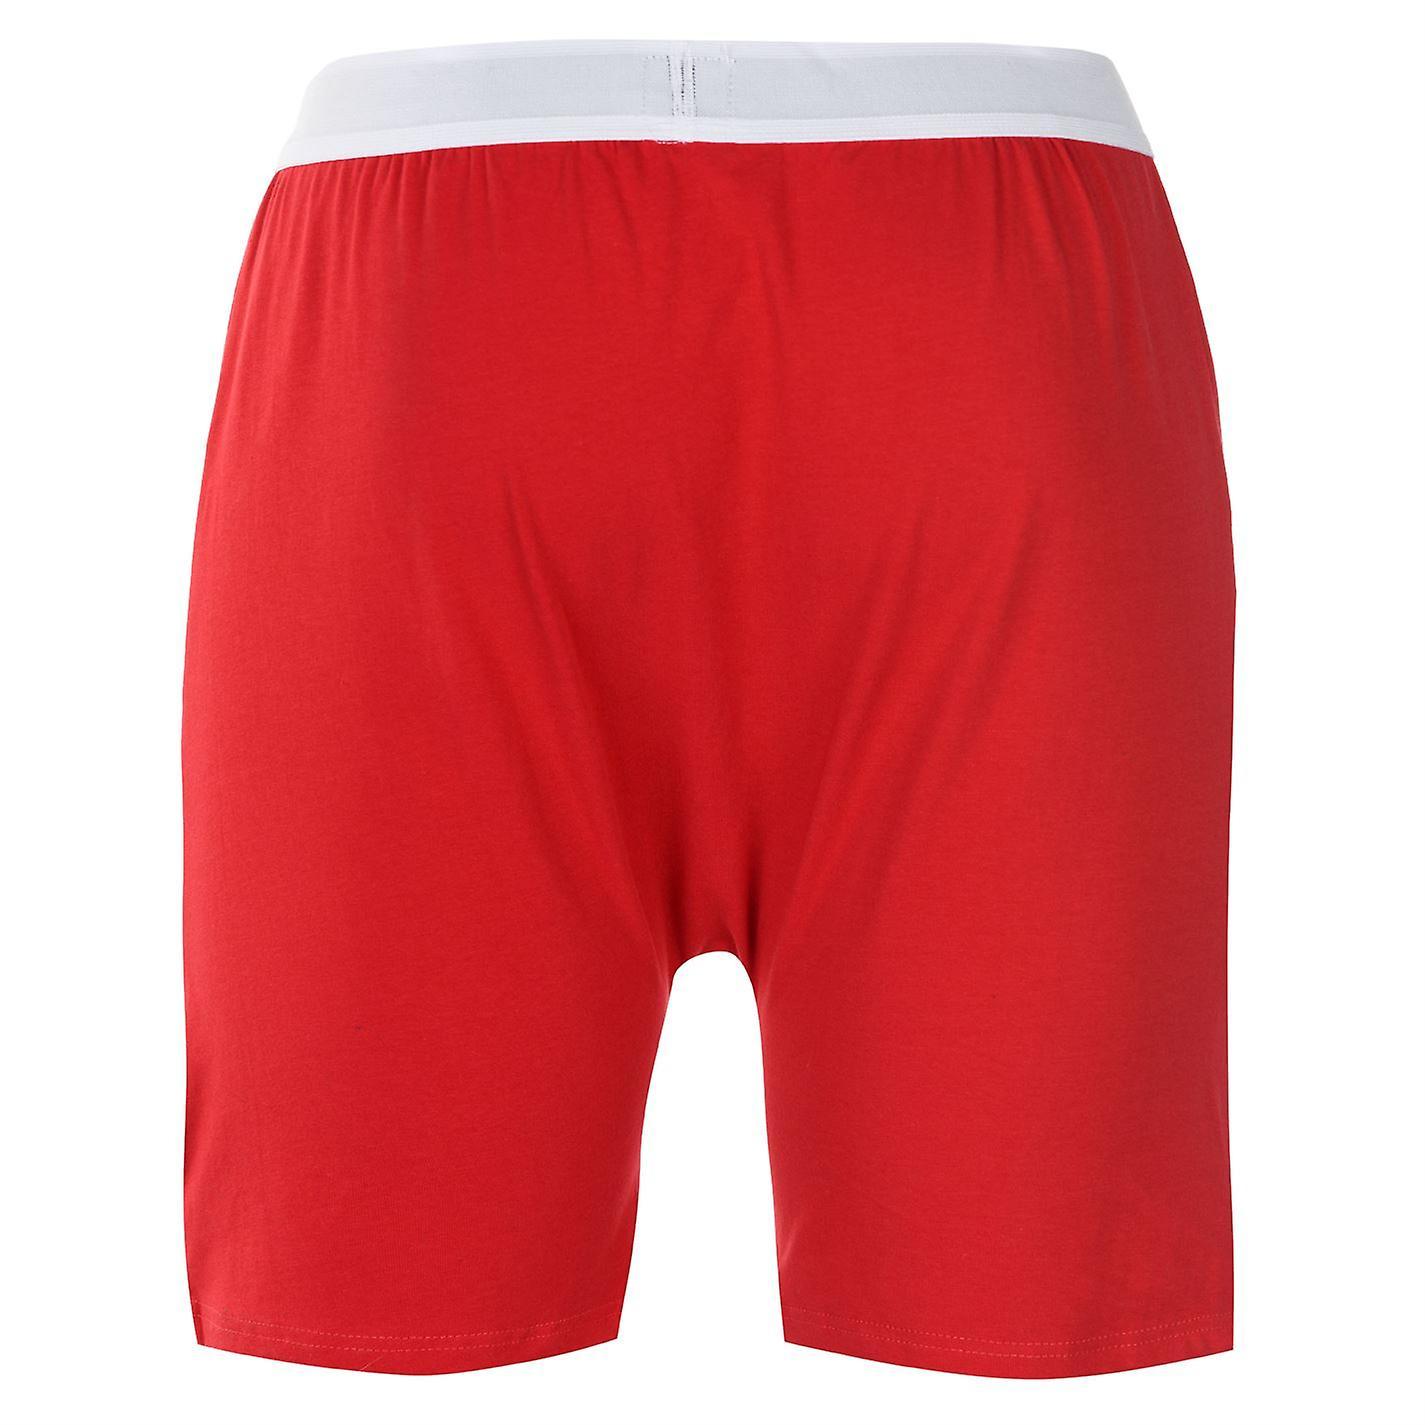 D555 Mens Christmas Claus Boxer Shorts Underwear Elasticated Waist